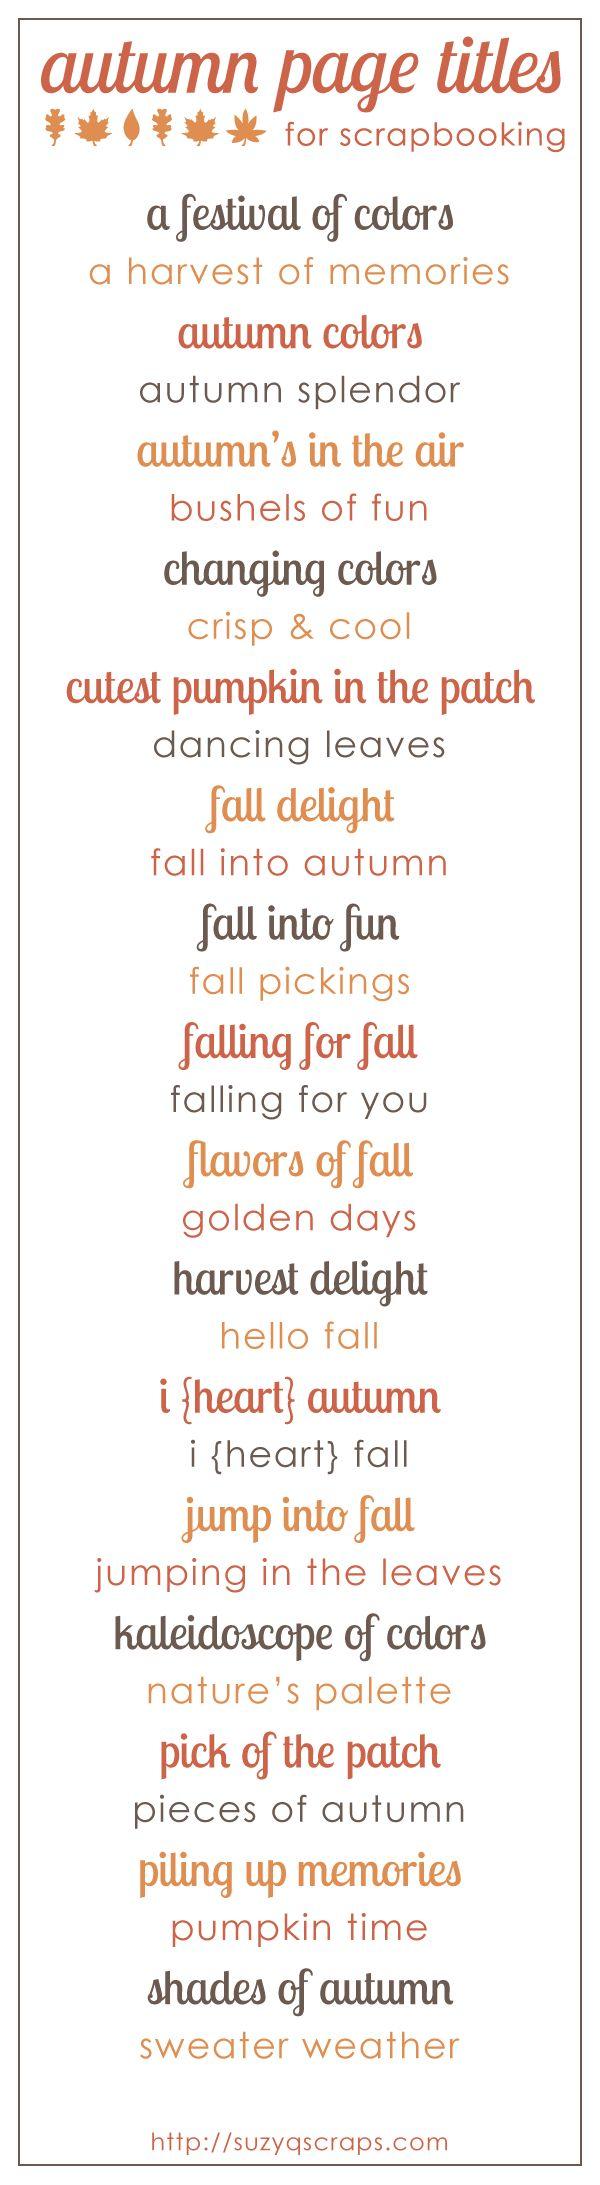 fall scrapbook ideas | fall & autumn scrapbook page titles